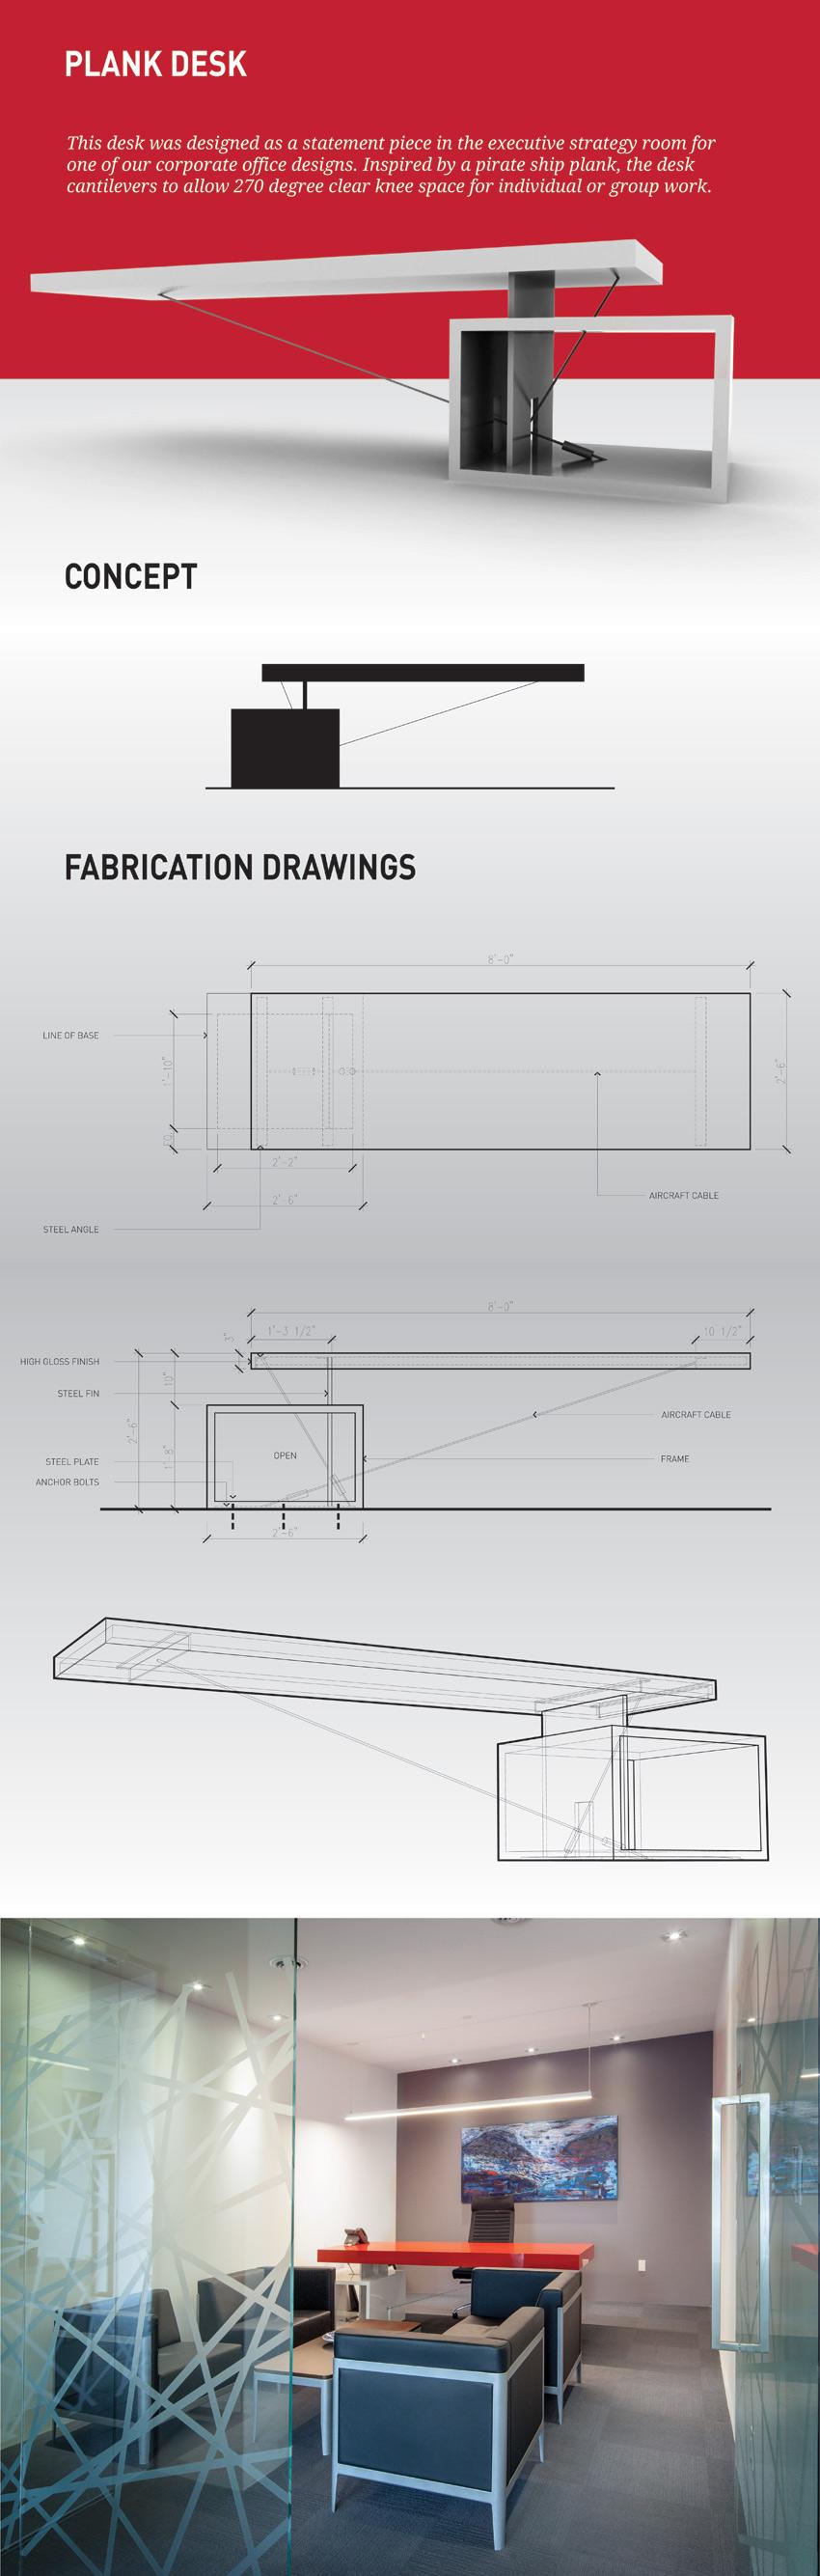 plank-desk2